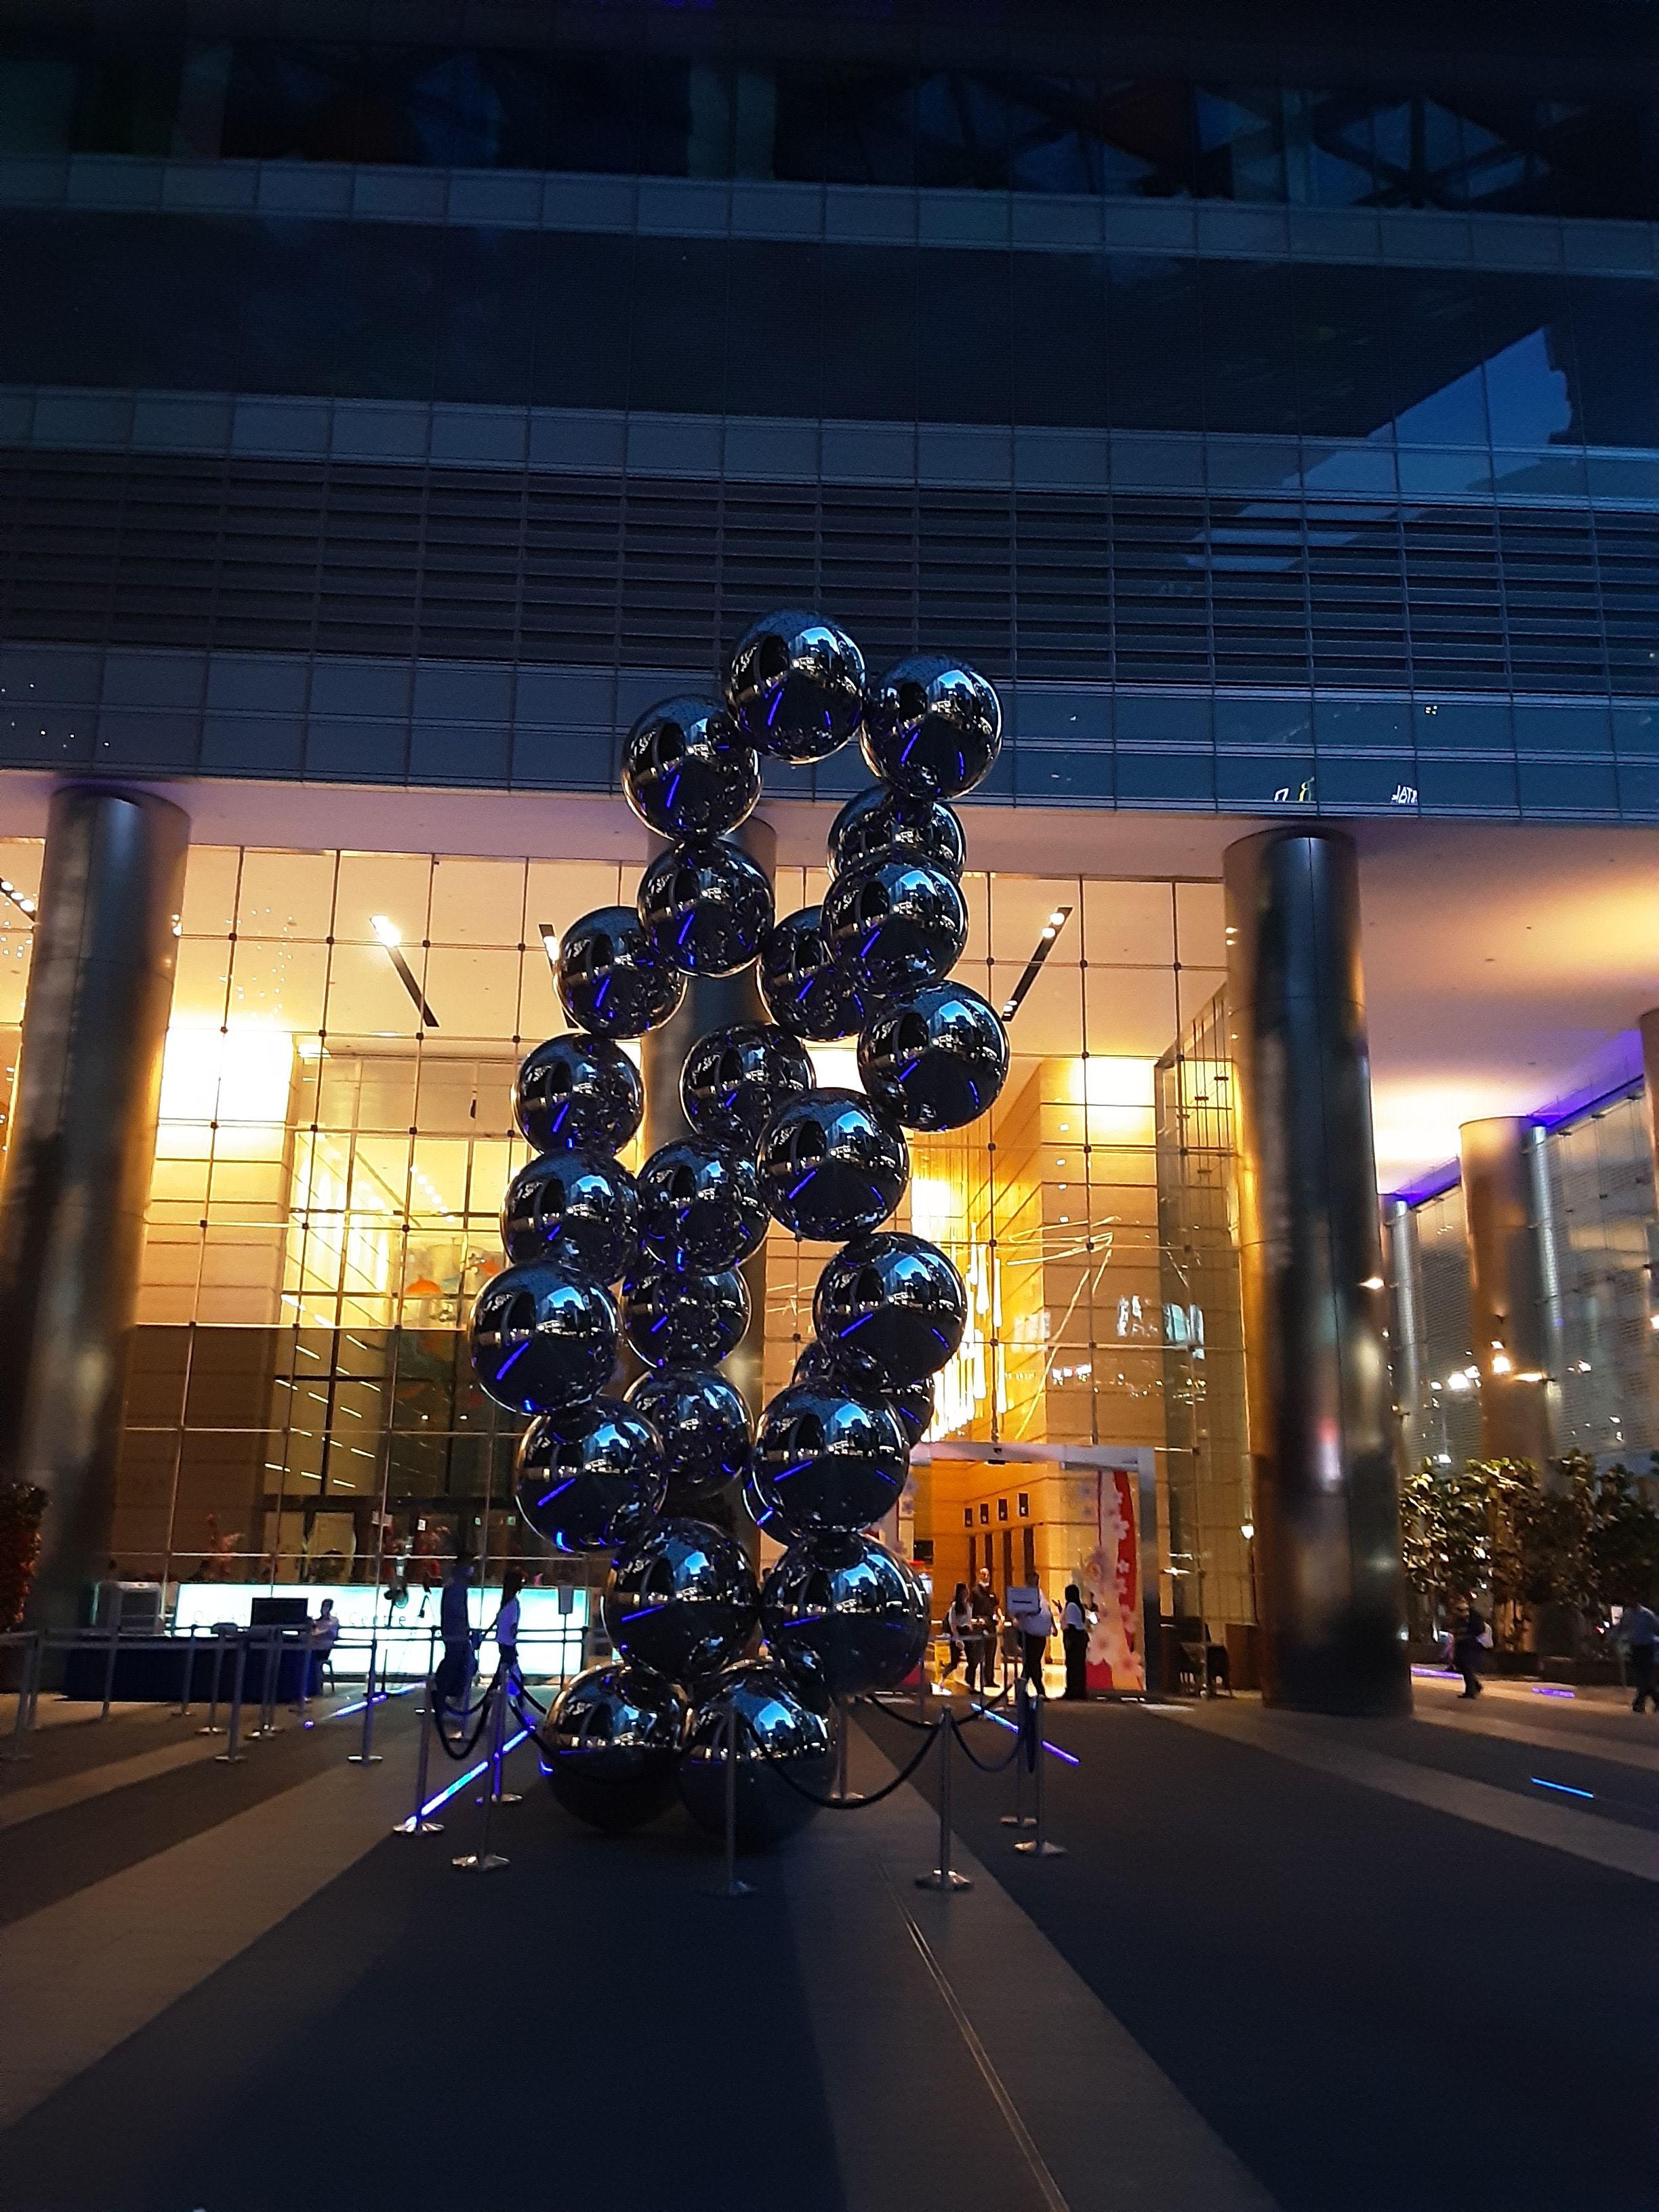 Pin By Gafferdesignart On Singapore Public Art Design Hotels Sculptures In 2020 Public Art Sculptures Design